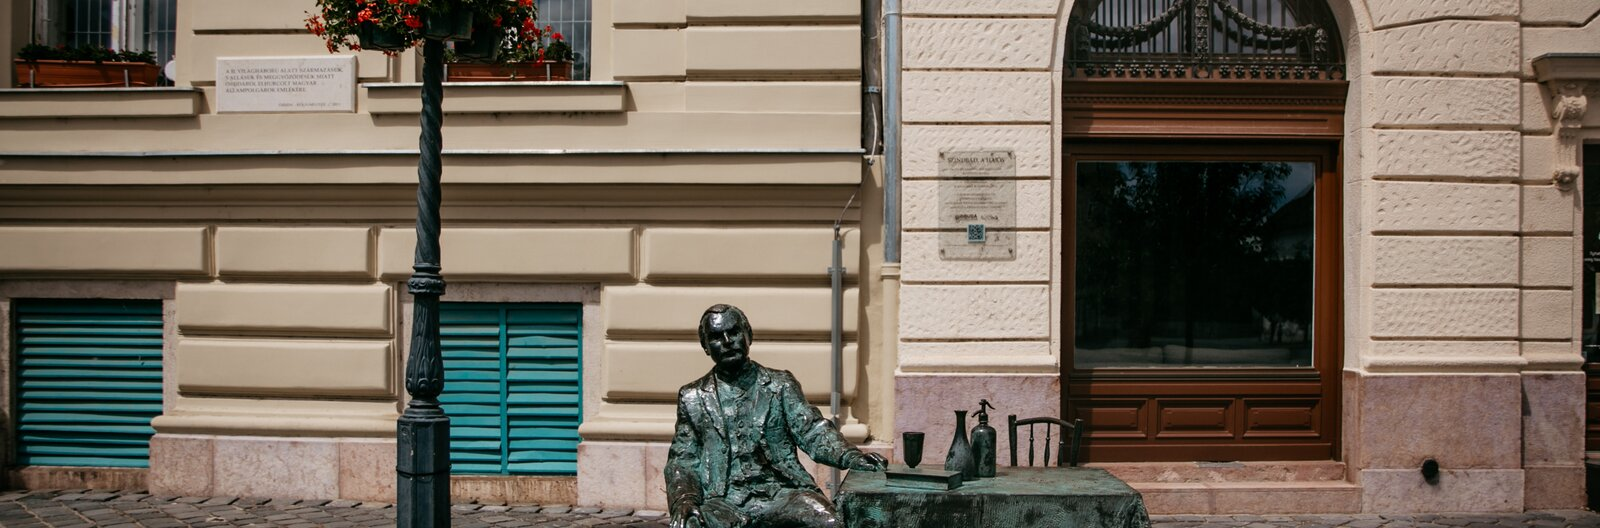 9 unique statues of 9 unique people in Budapest